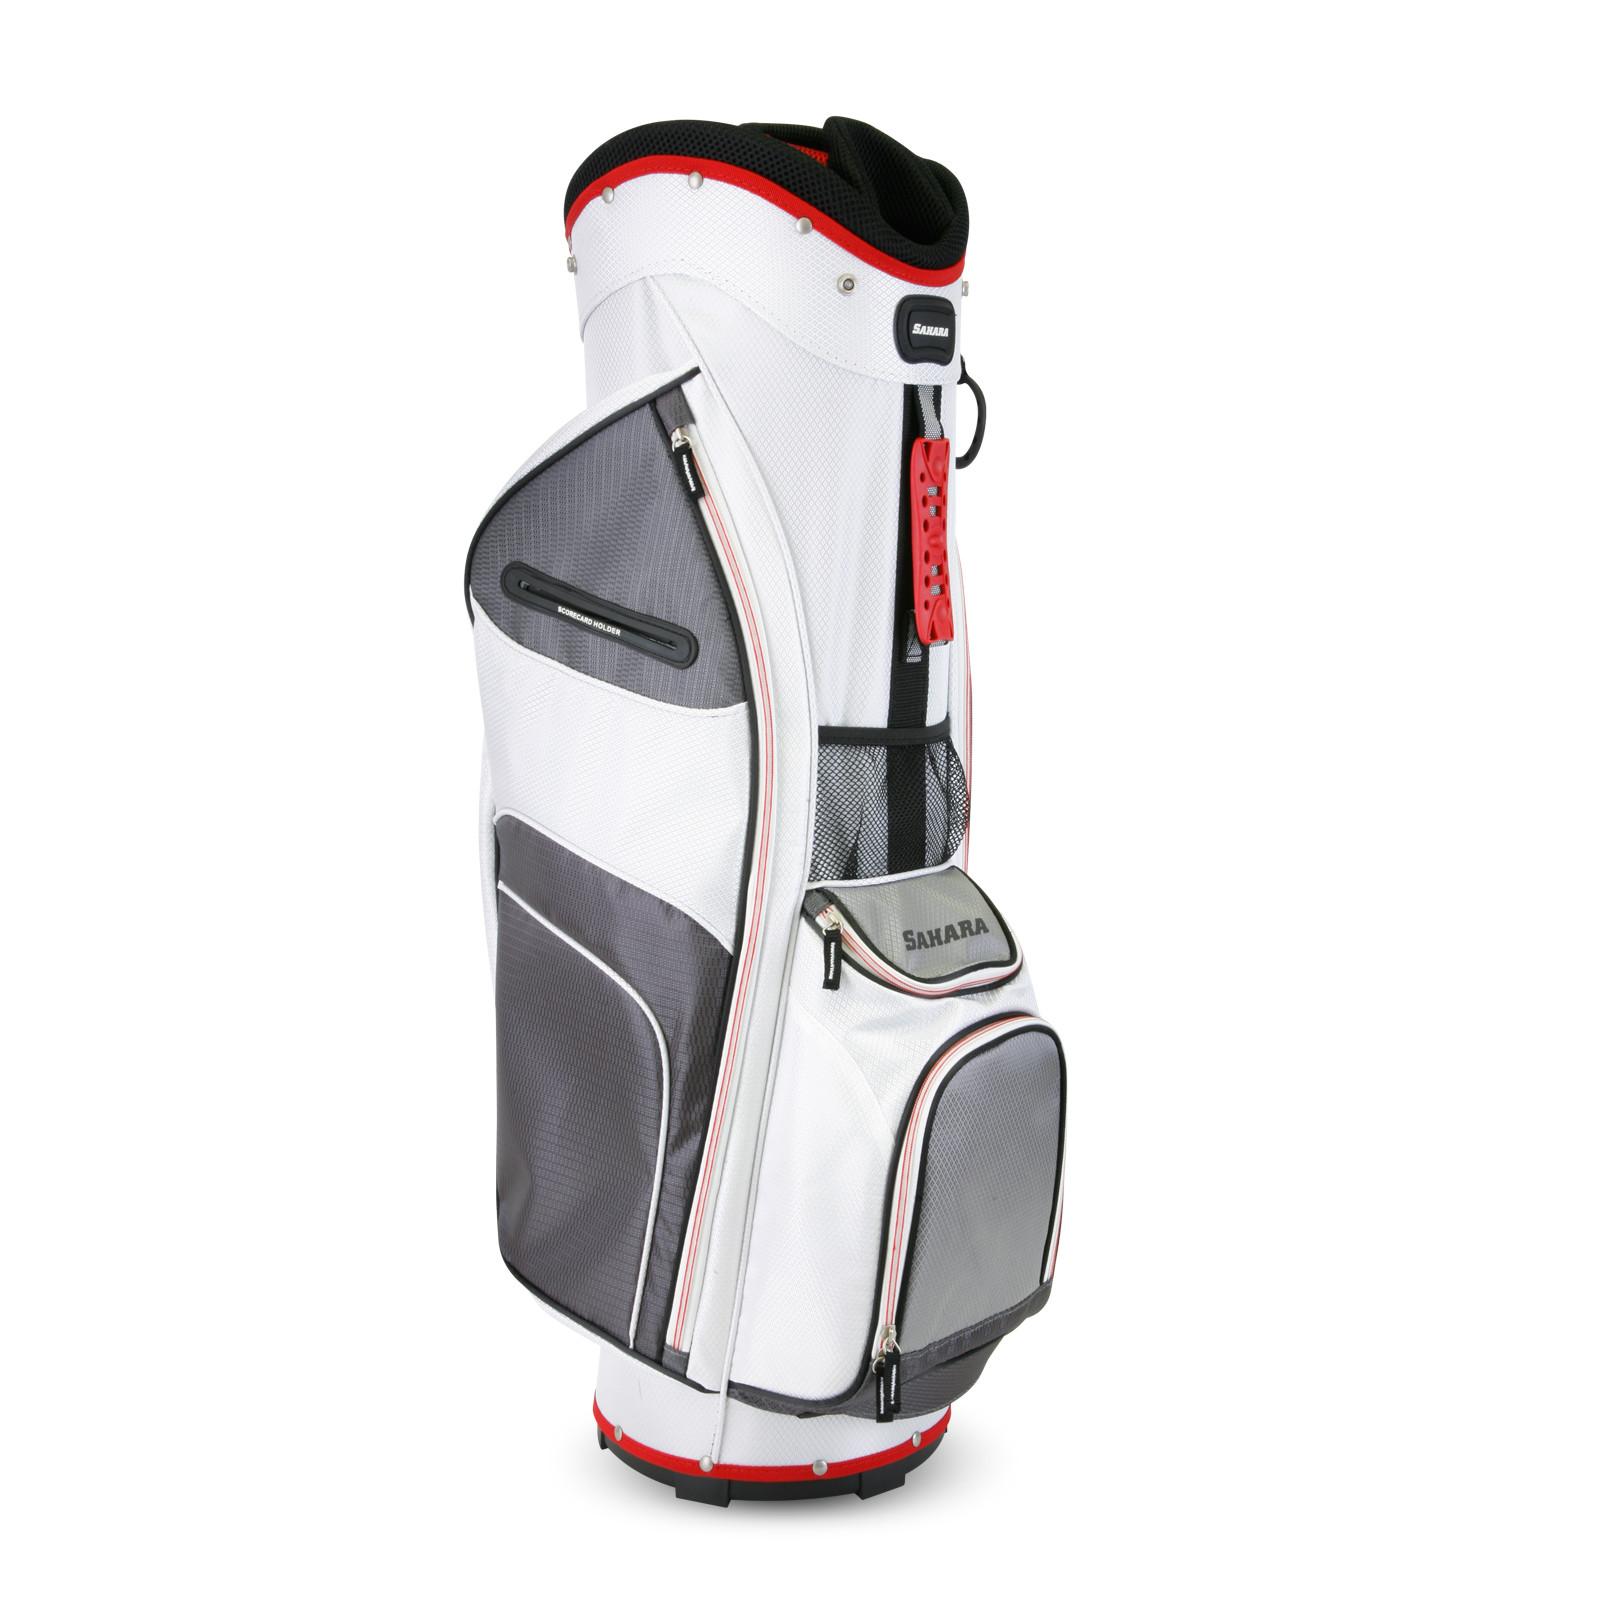 2015 Sahara Baja Lite Golf Cart Bag White/Gray/Red